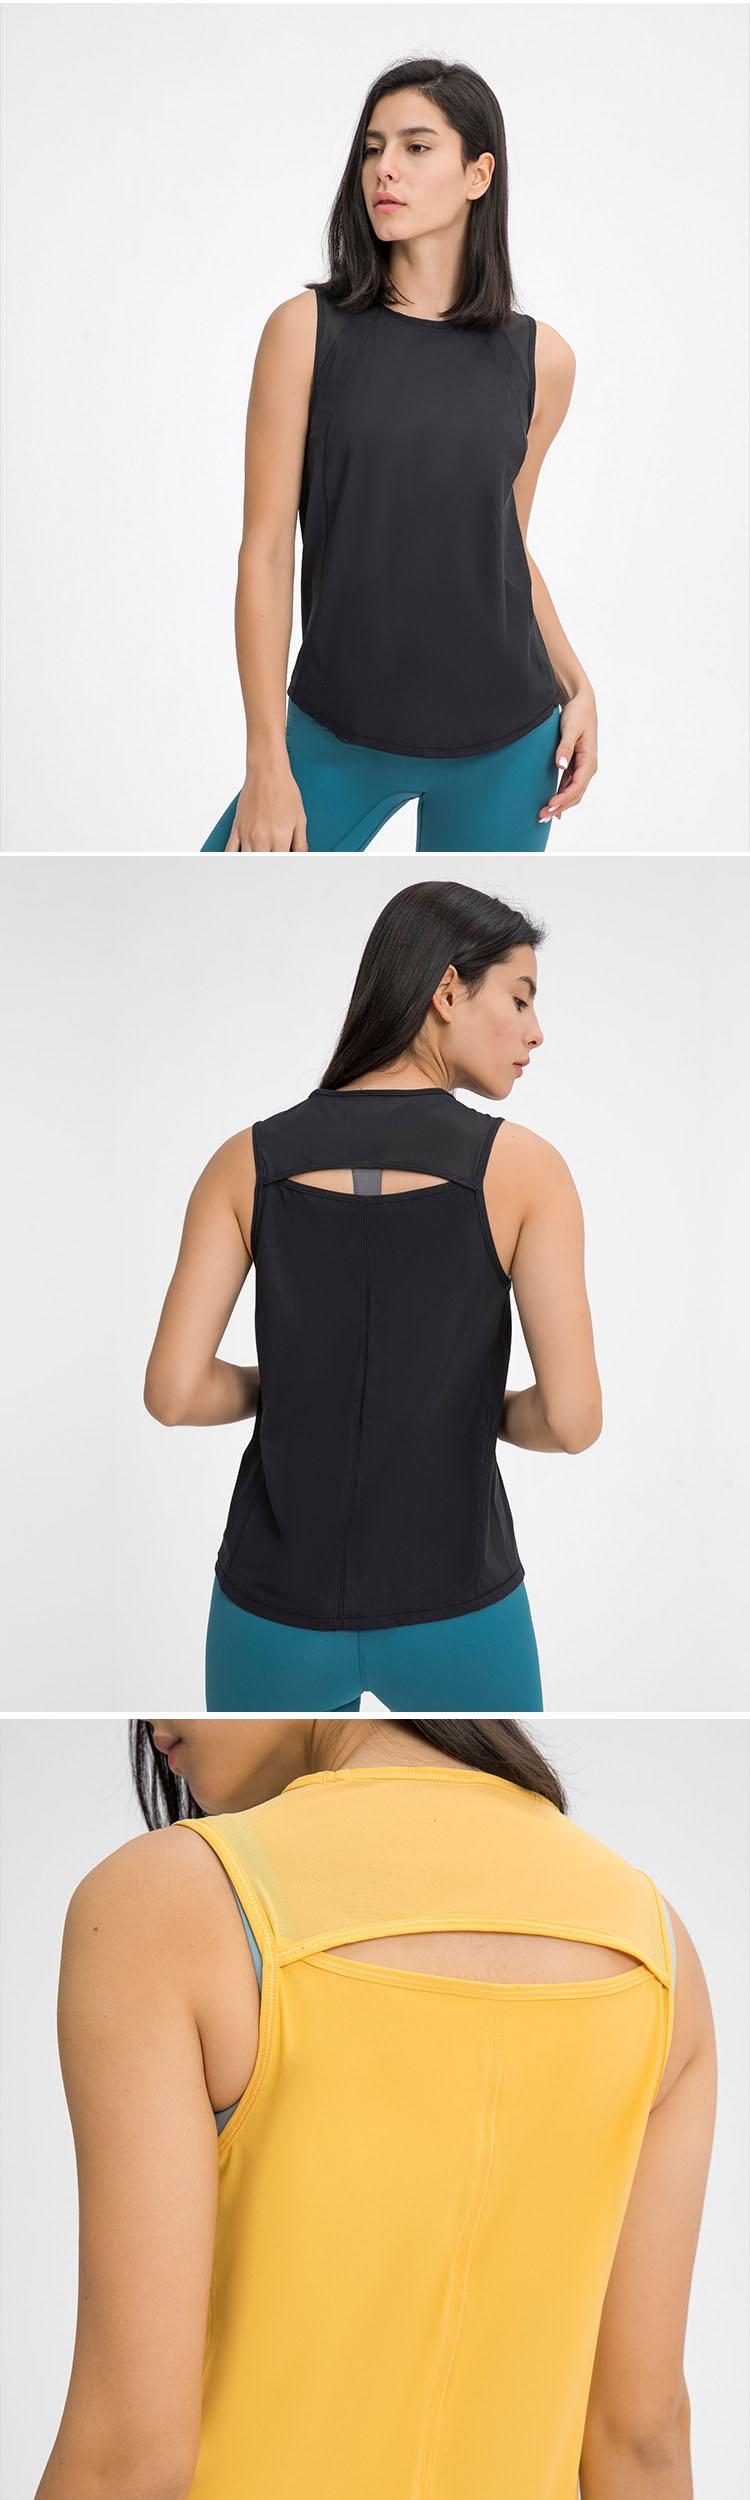 Quick-drying fabrics, moisture wicking, maintain sports comfort.